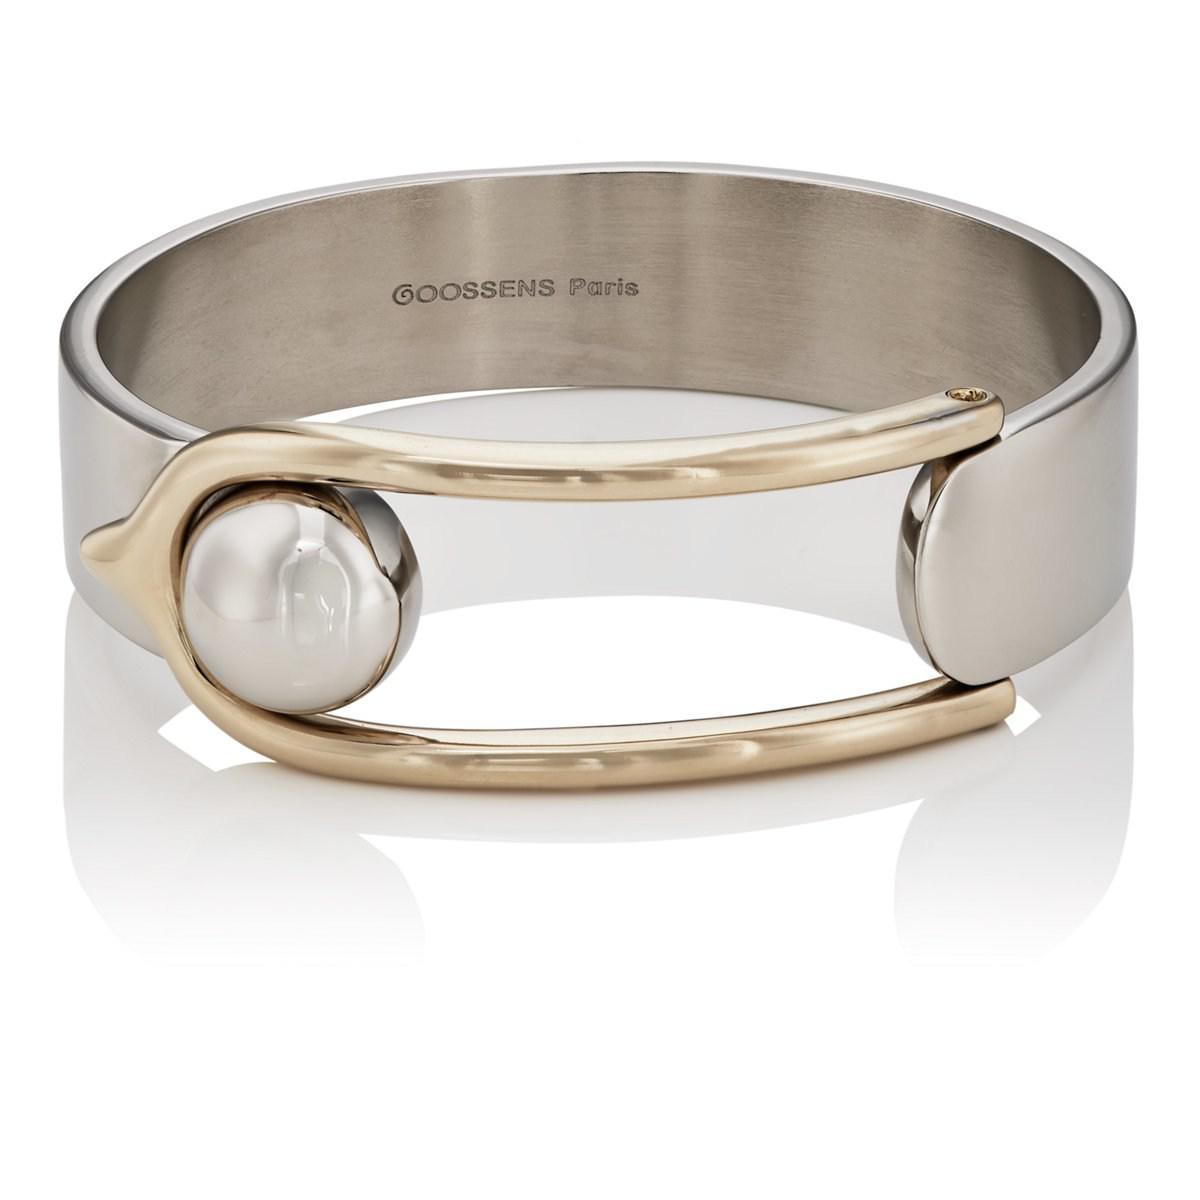 Goossens Paris Womens Loop Bracelet pUBGut